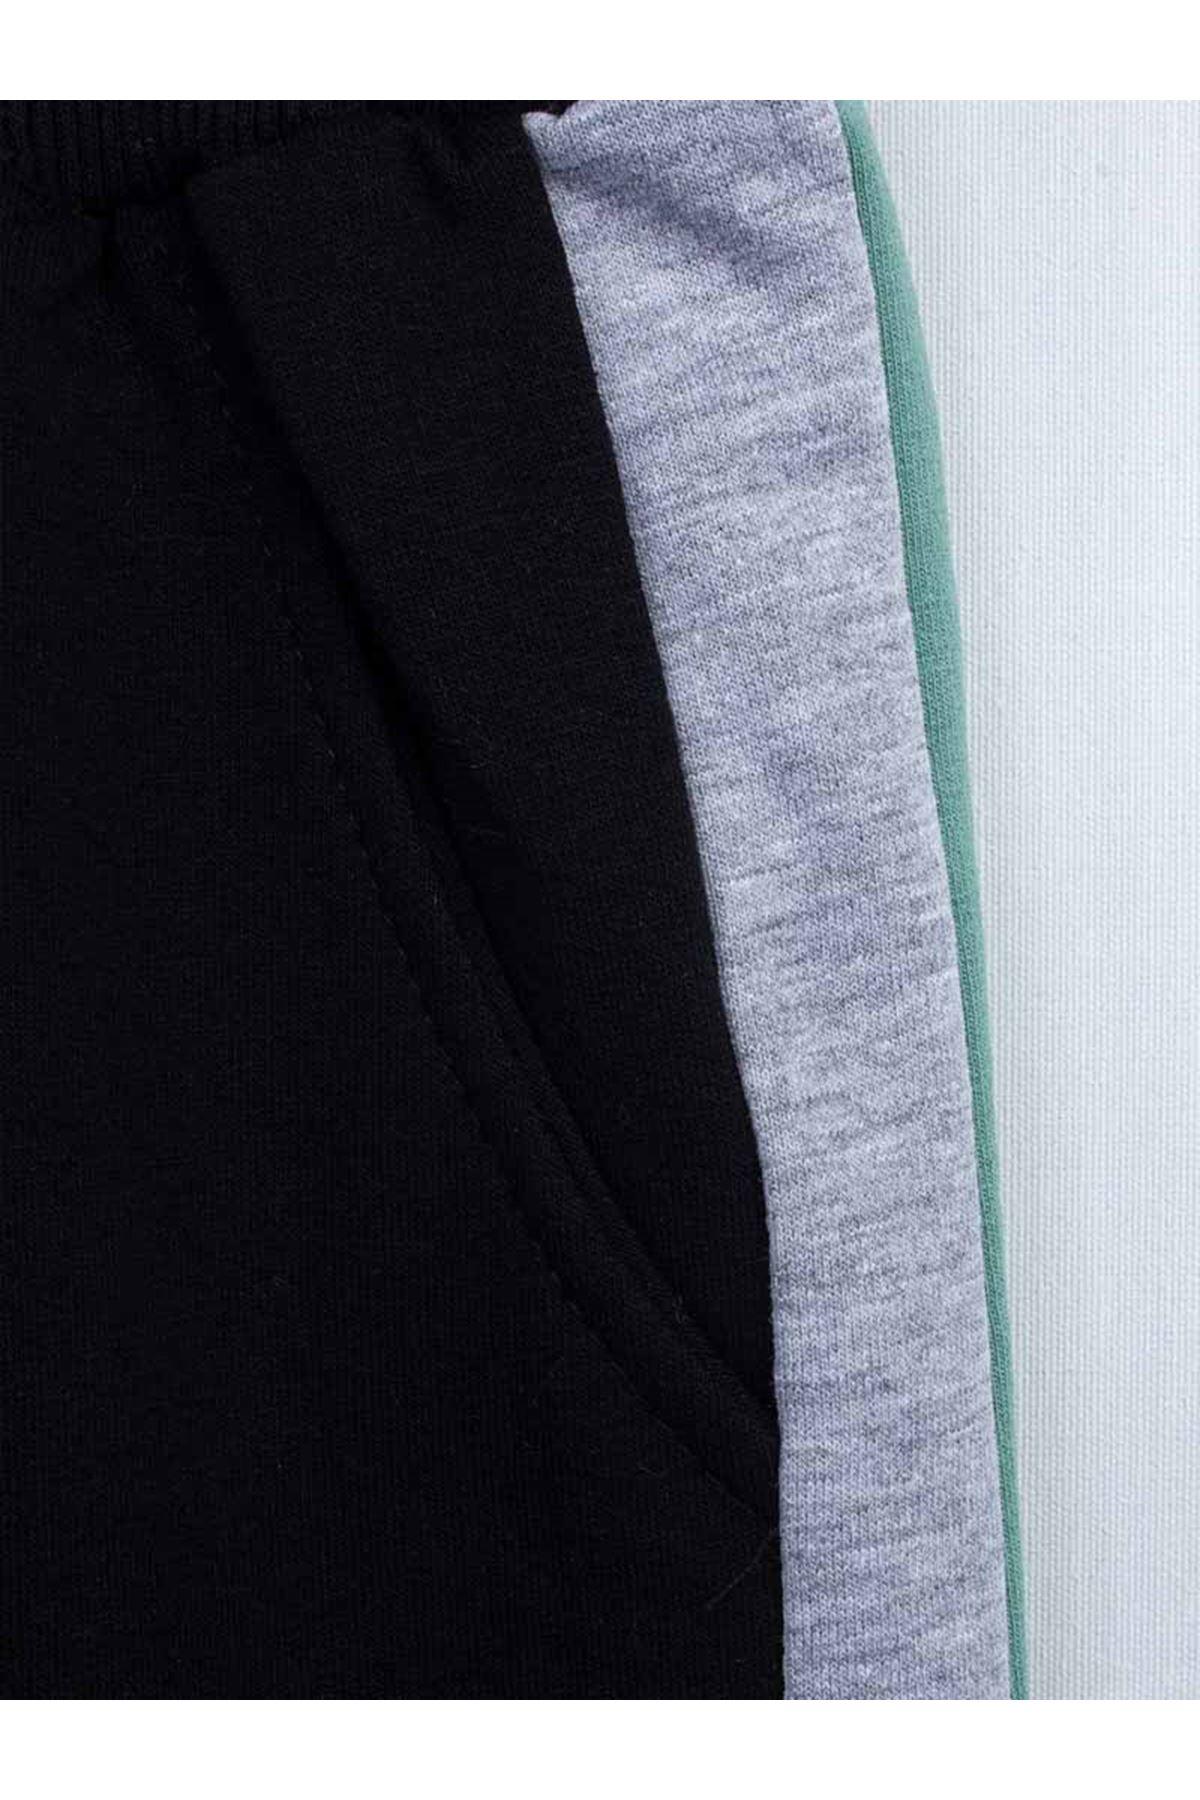 Gray green black girls seasonal bottom tracksuit top sweatshirt casual cotton cute tracksuit models